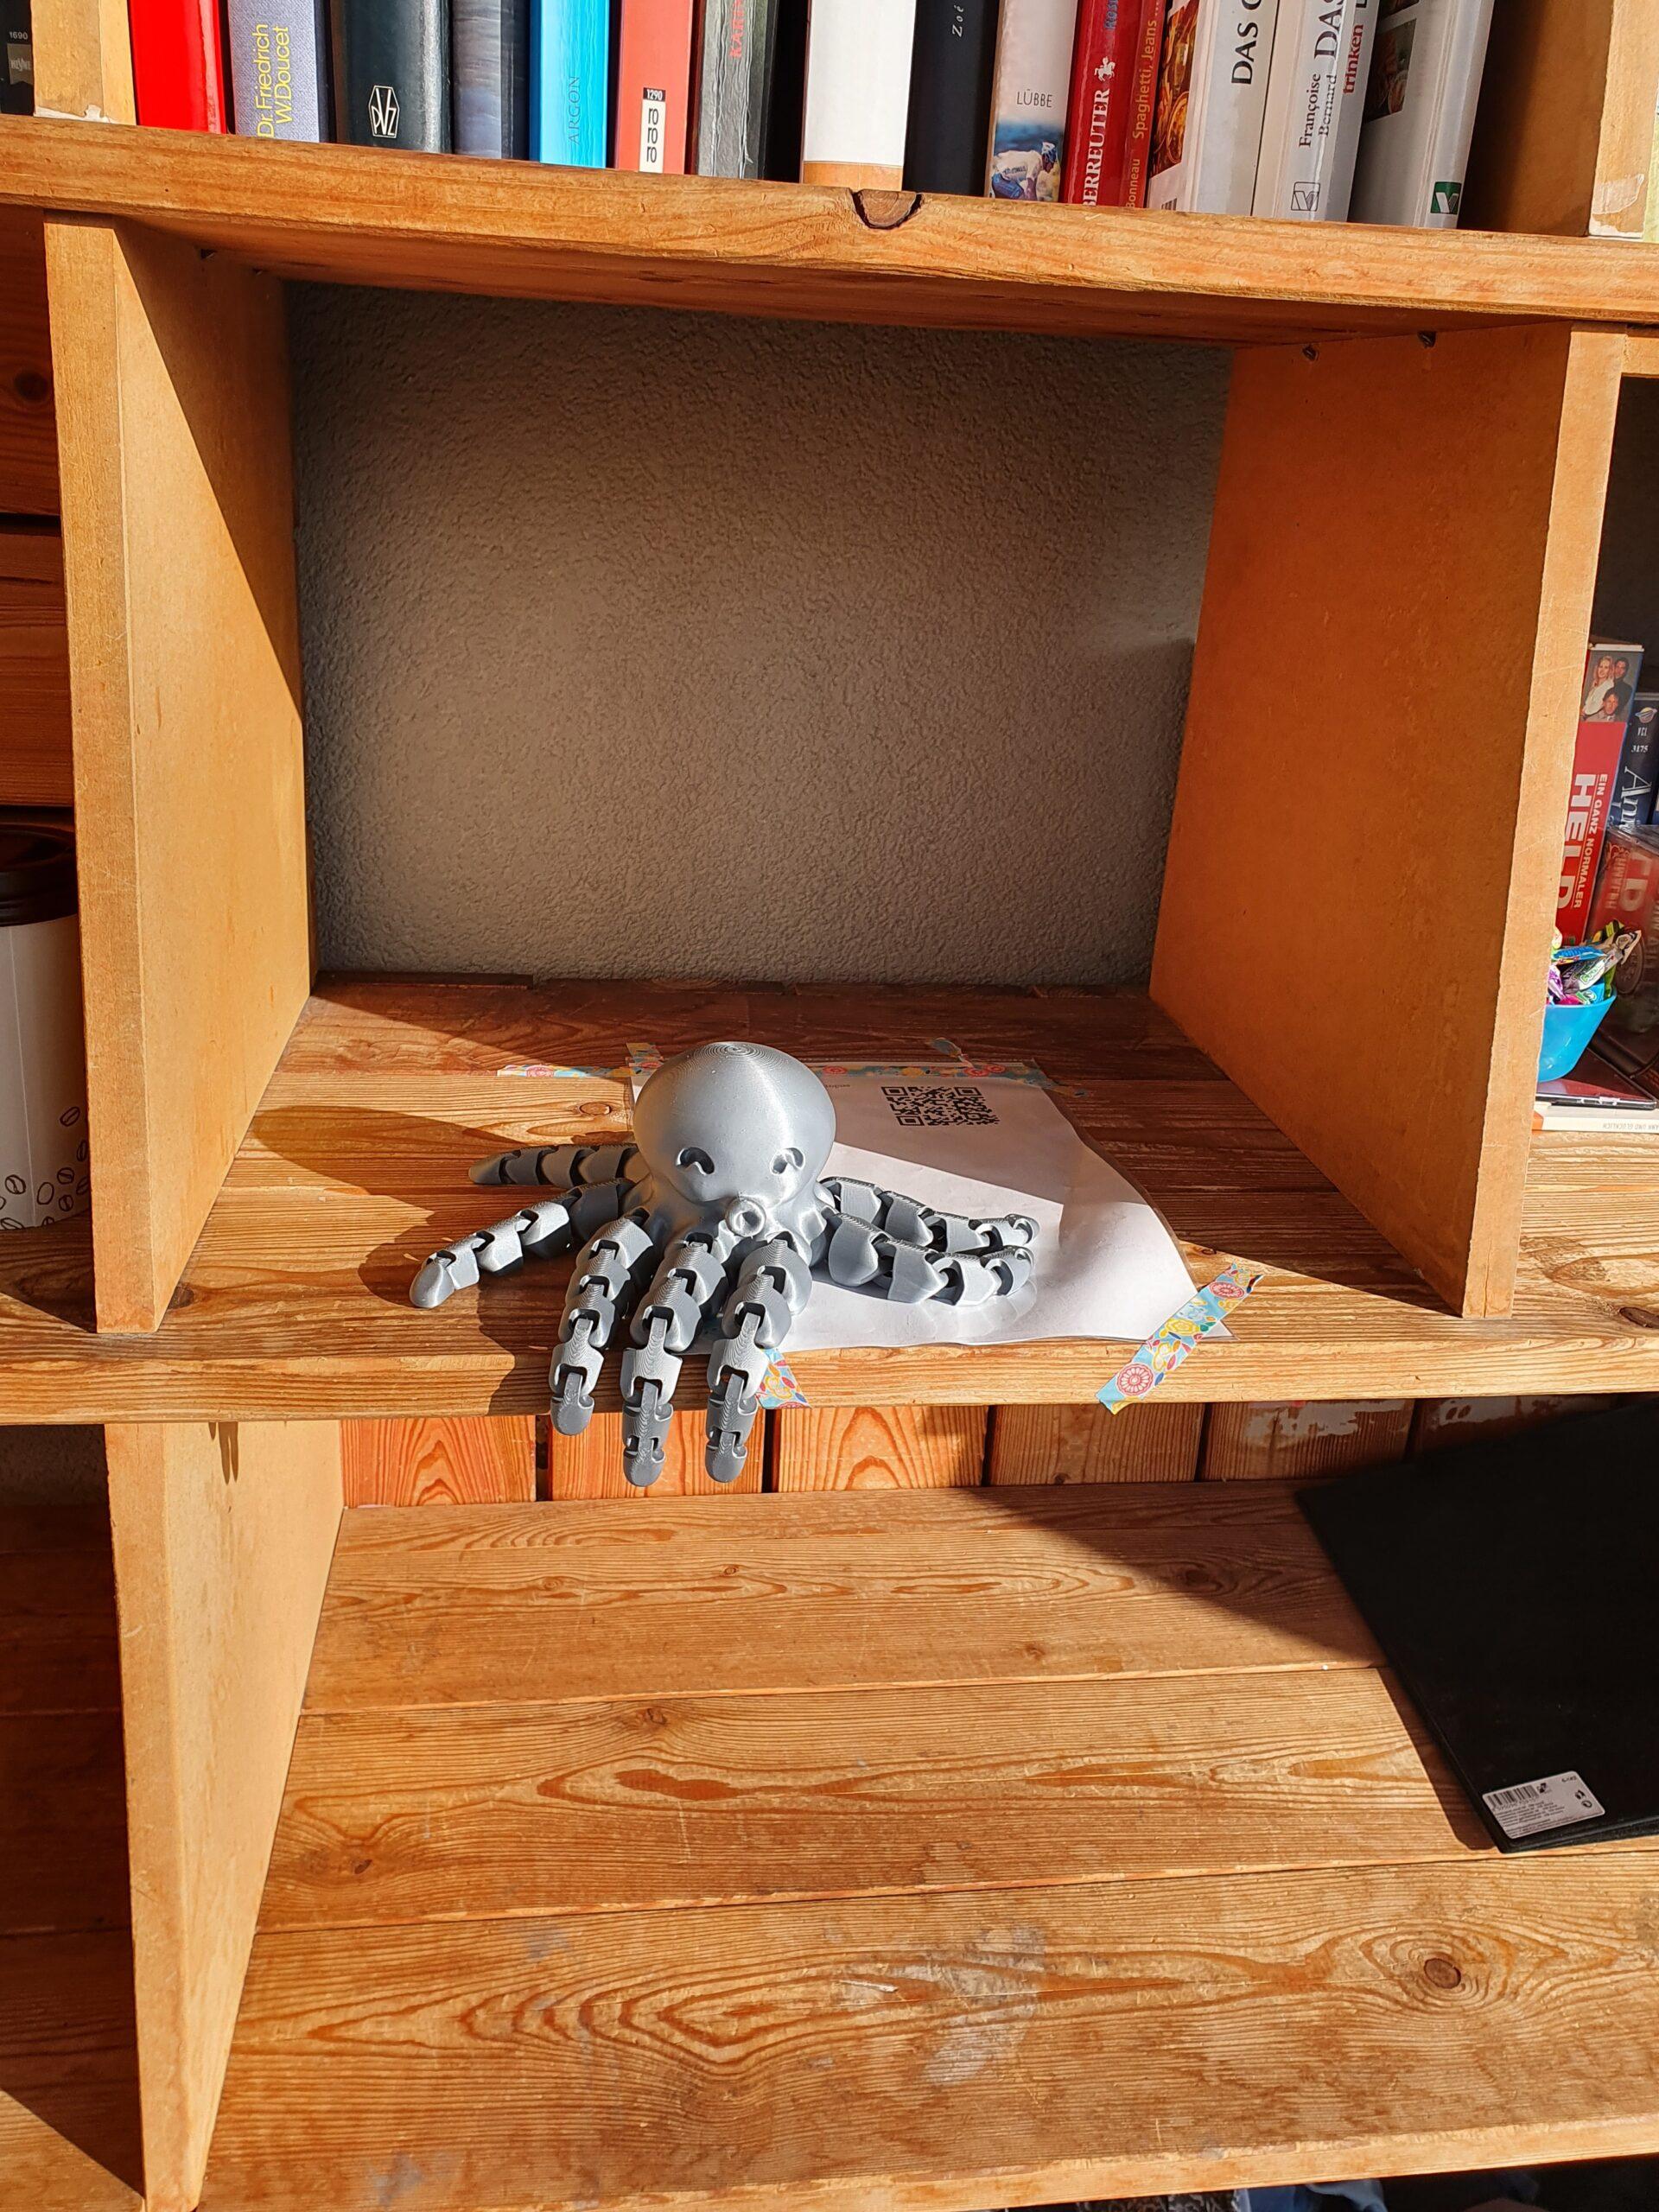 A gray 3d-printed octopus sitting inside a wooden shelf.